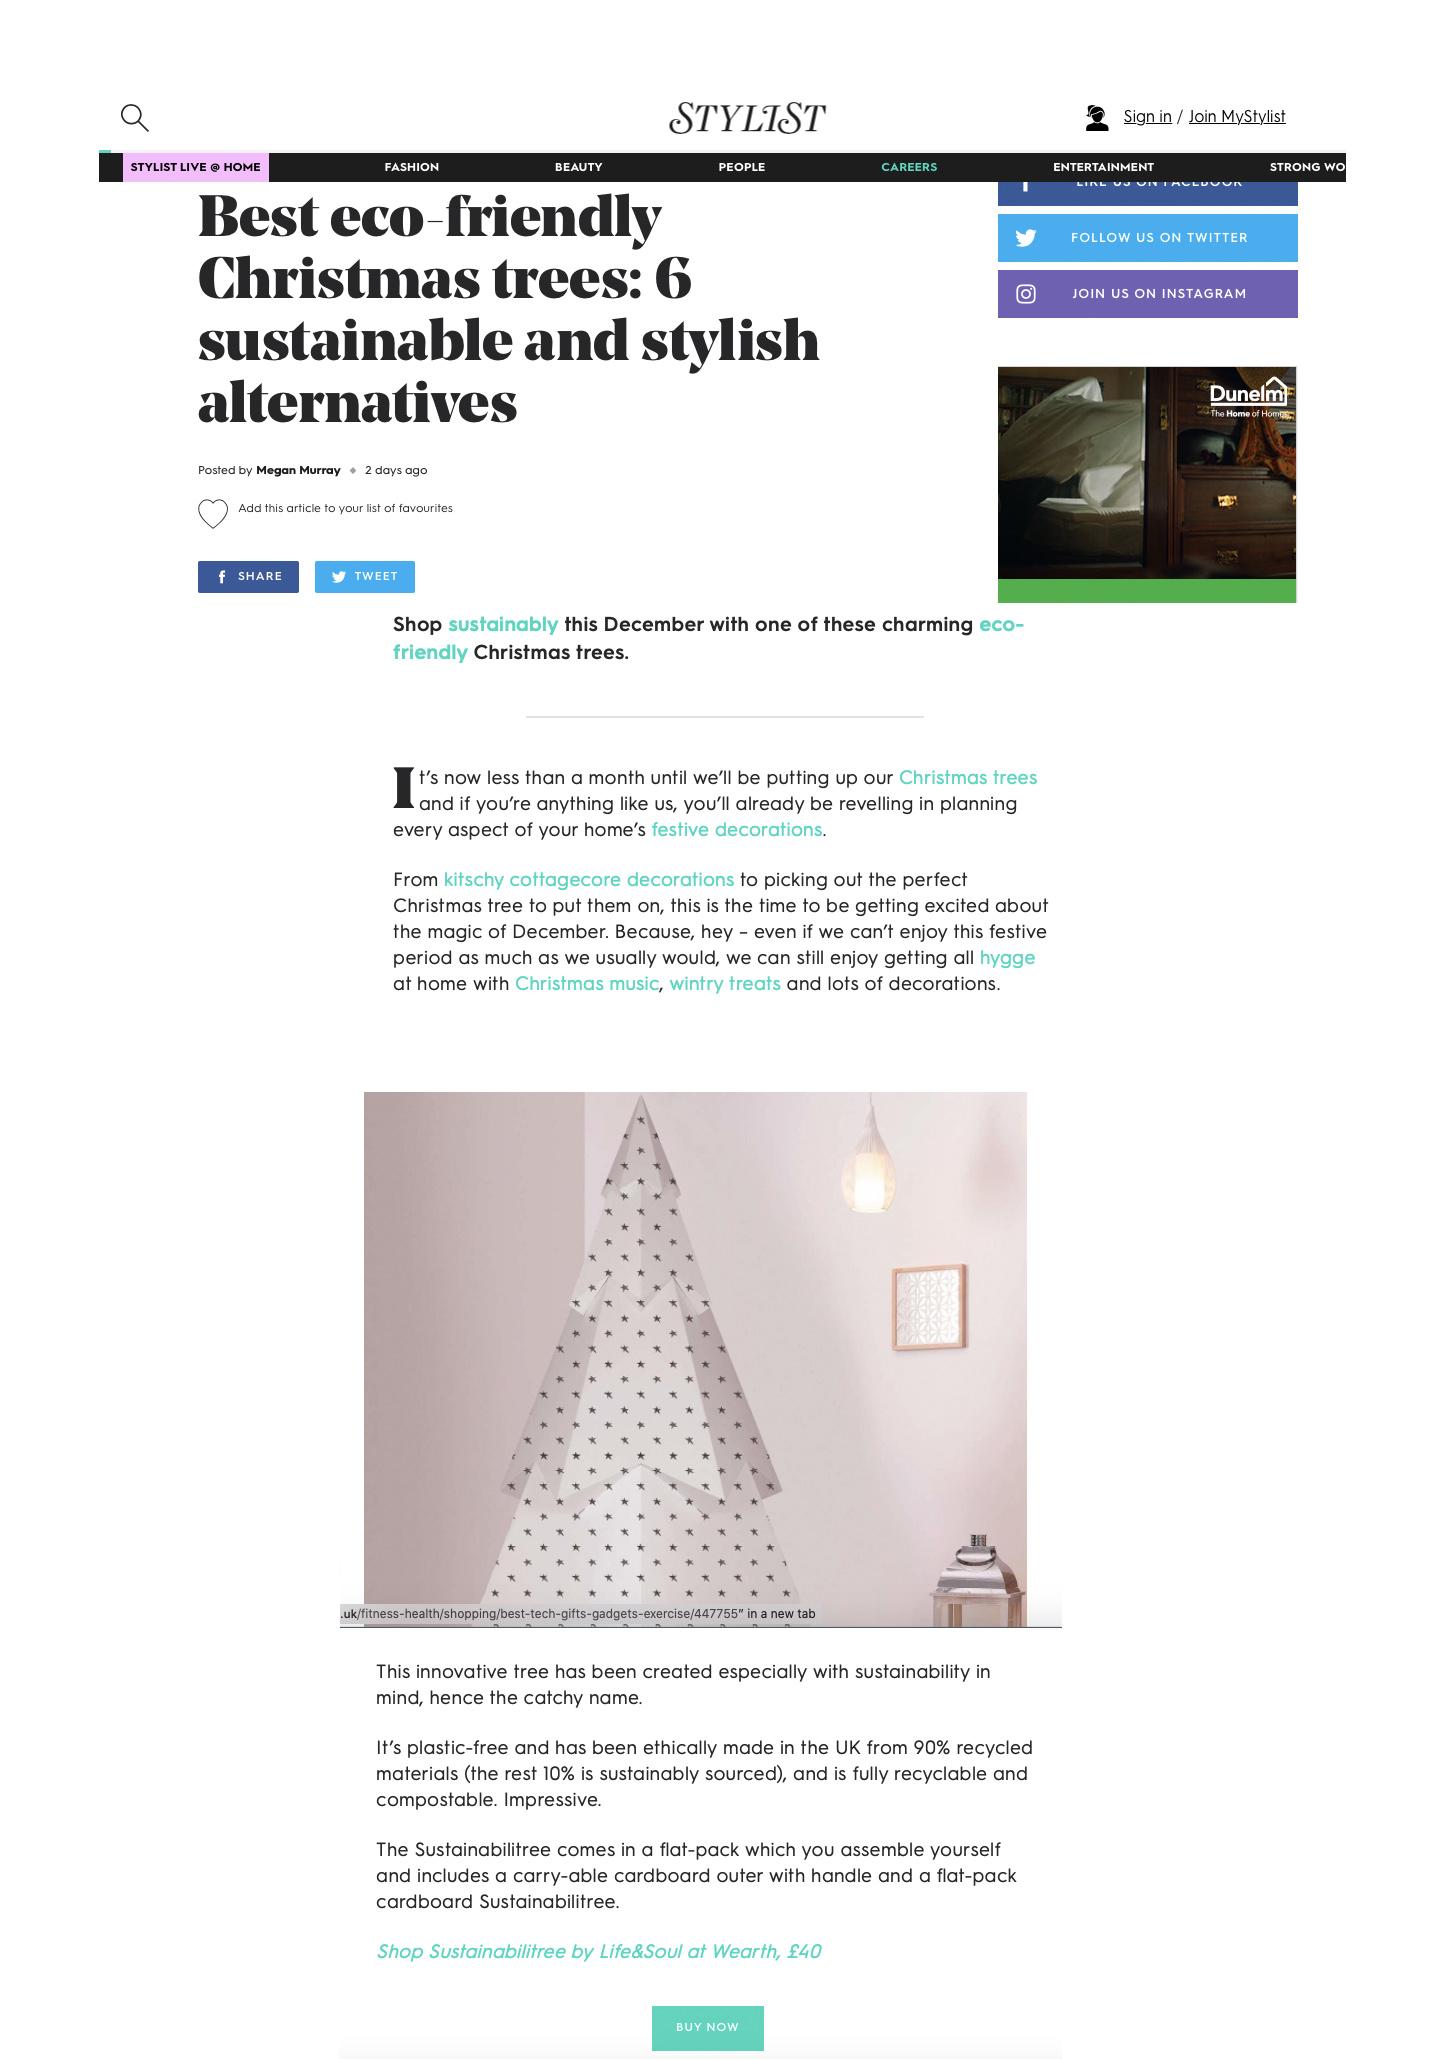 Stylist, sustainabilitree, LPPR